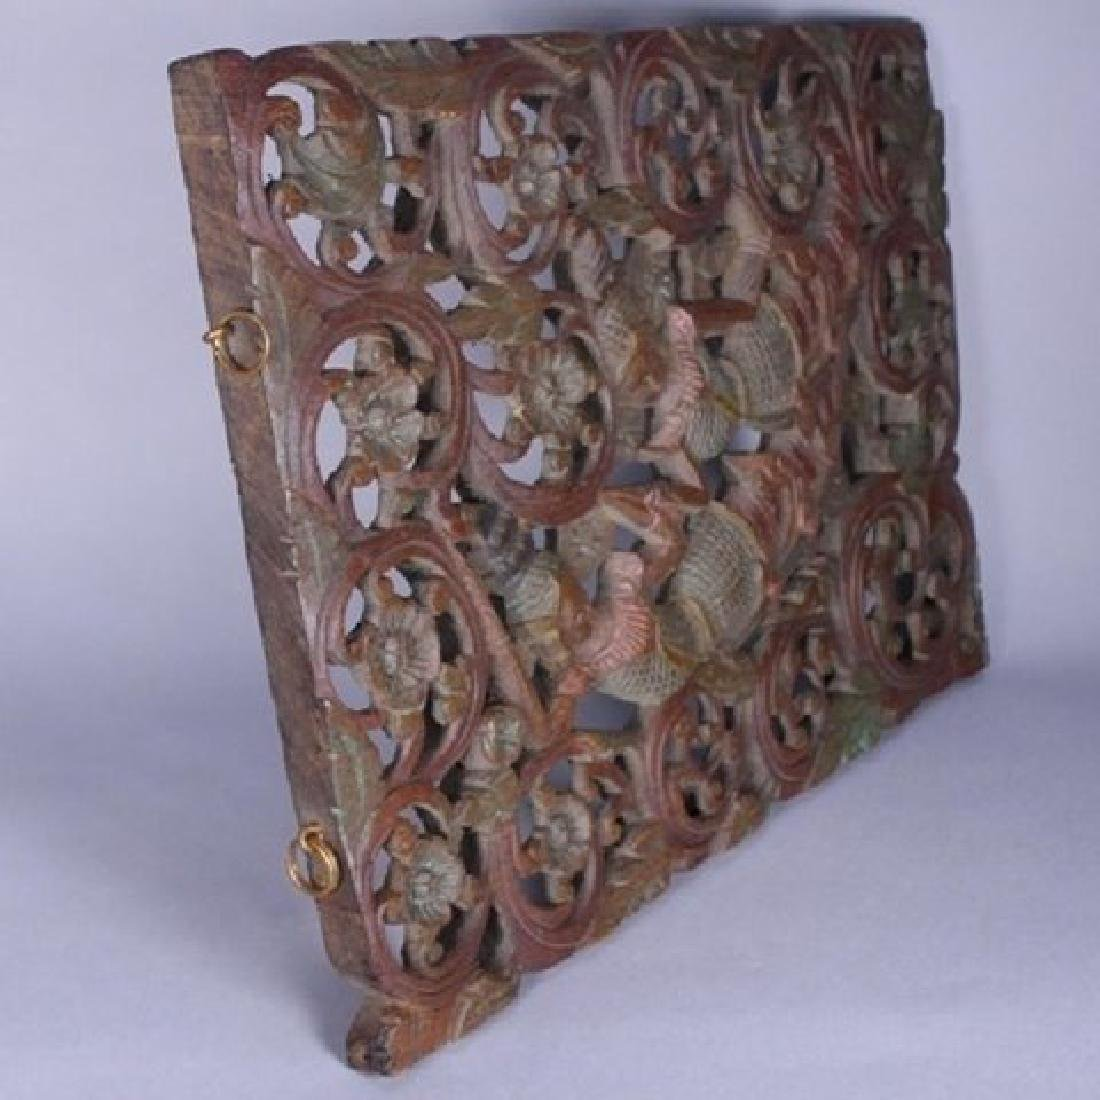 Decorative Tibetan Carved Teakwood Wall Hanger - 6